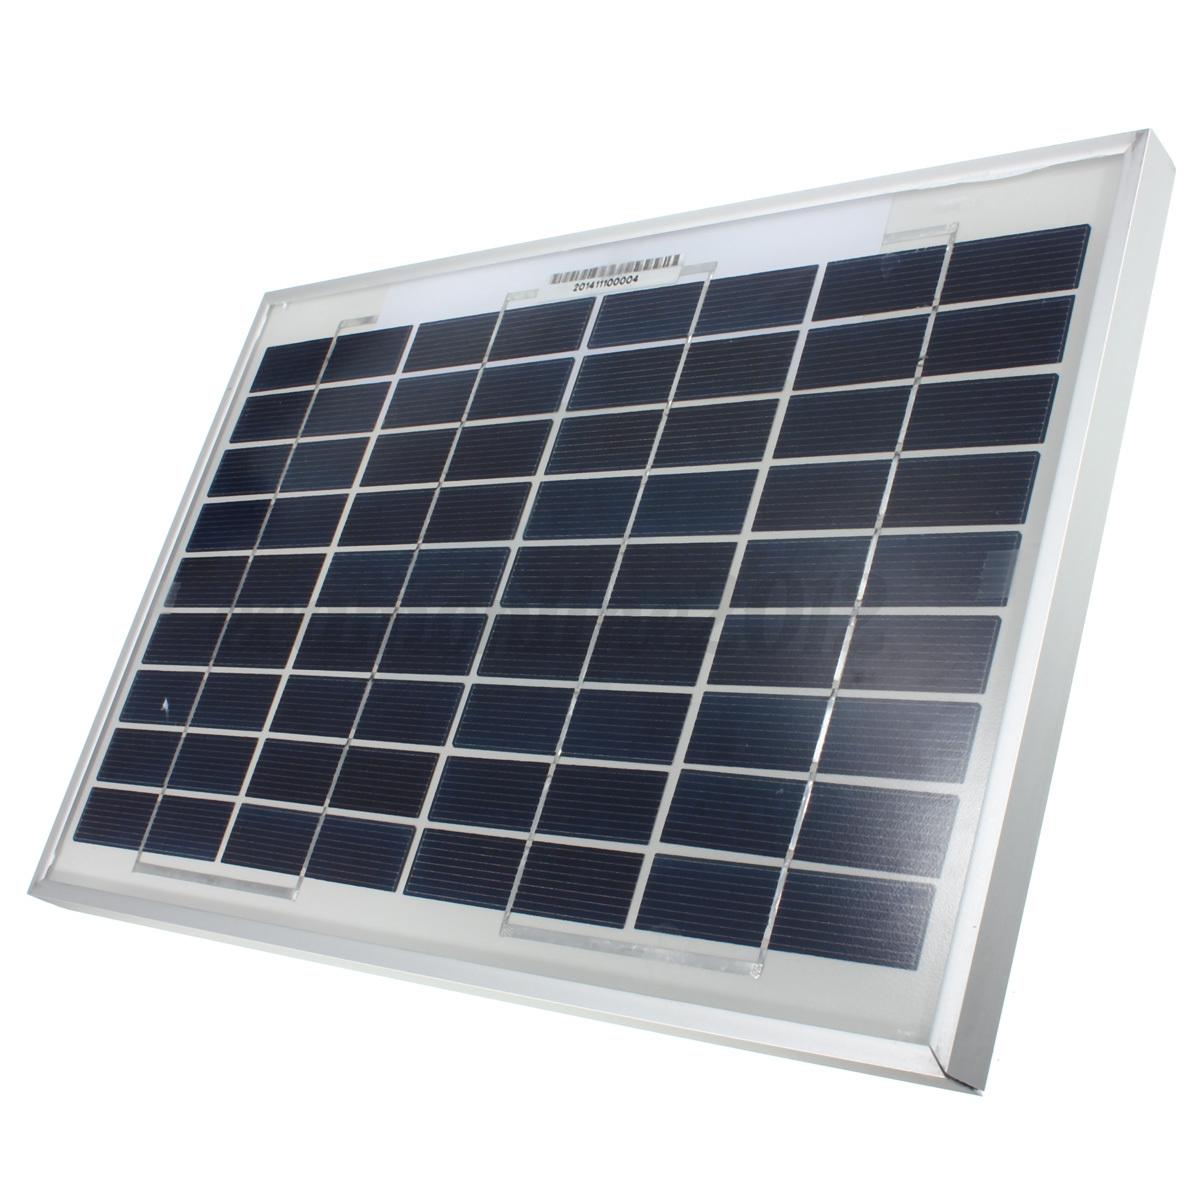 M dulo fotovoltaico c lulas solares panel solar peque o for Panel solar pequeno